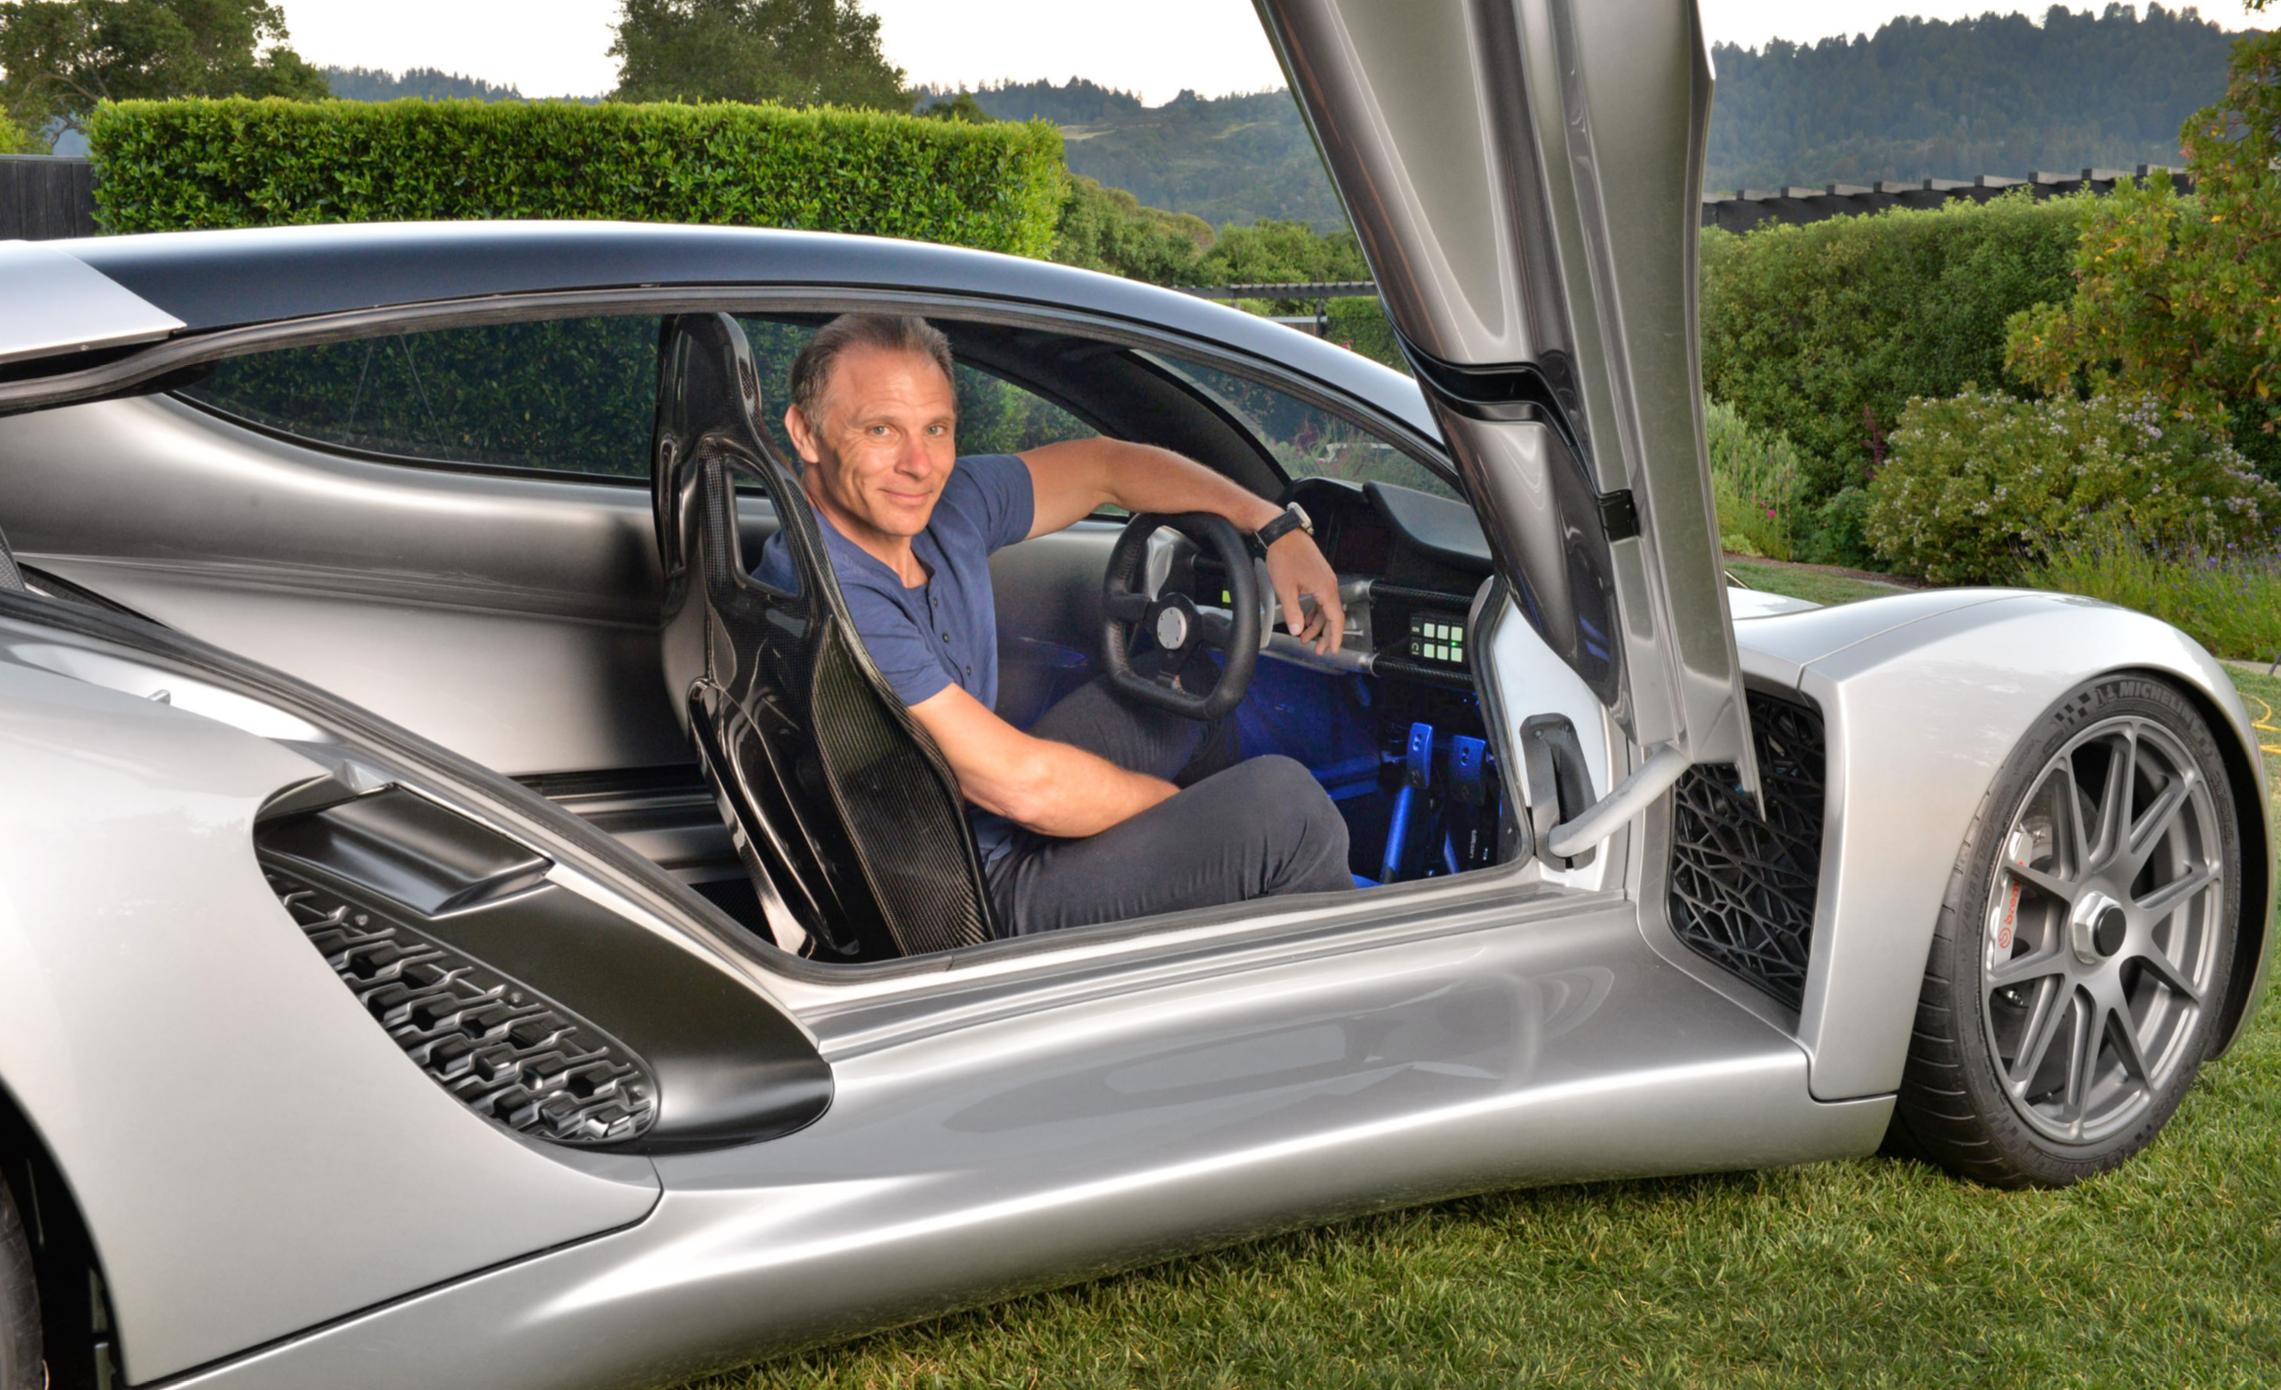 Divergent 3D获6500万美元B轮投资利用3D打印革新汽车行业 3D打印 第1张-泥人传说